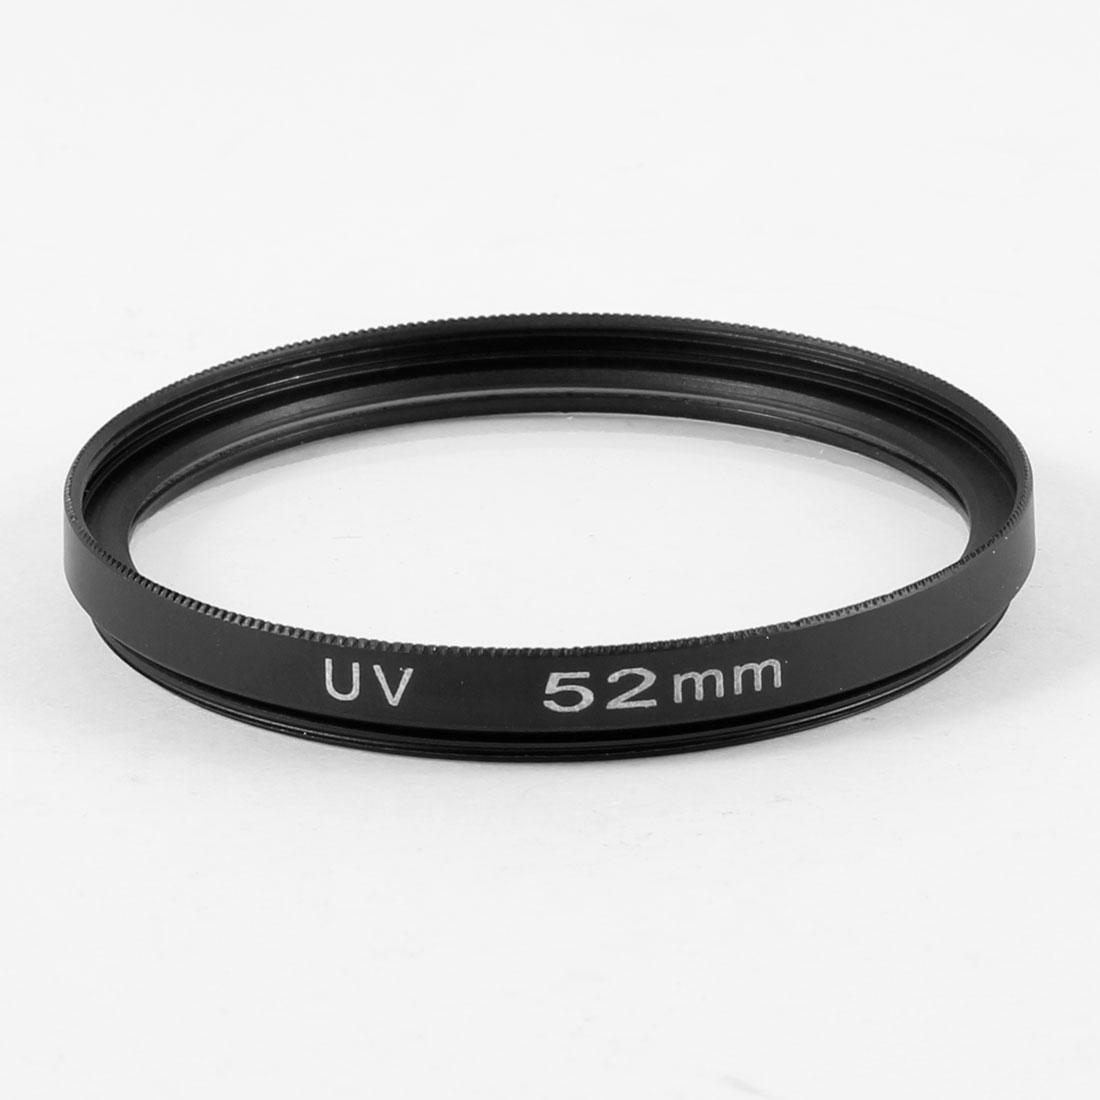 Digital Camera 52mm Multi Coated Protector Ultra-Violet UV Lens Filter Black